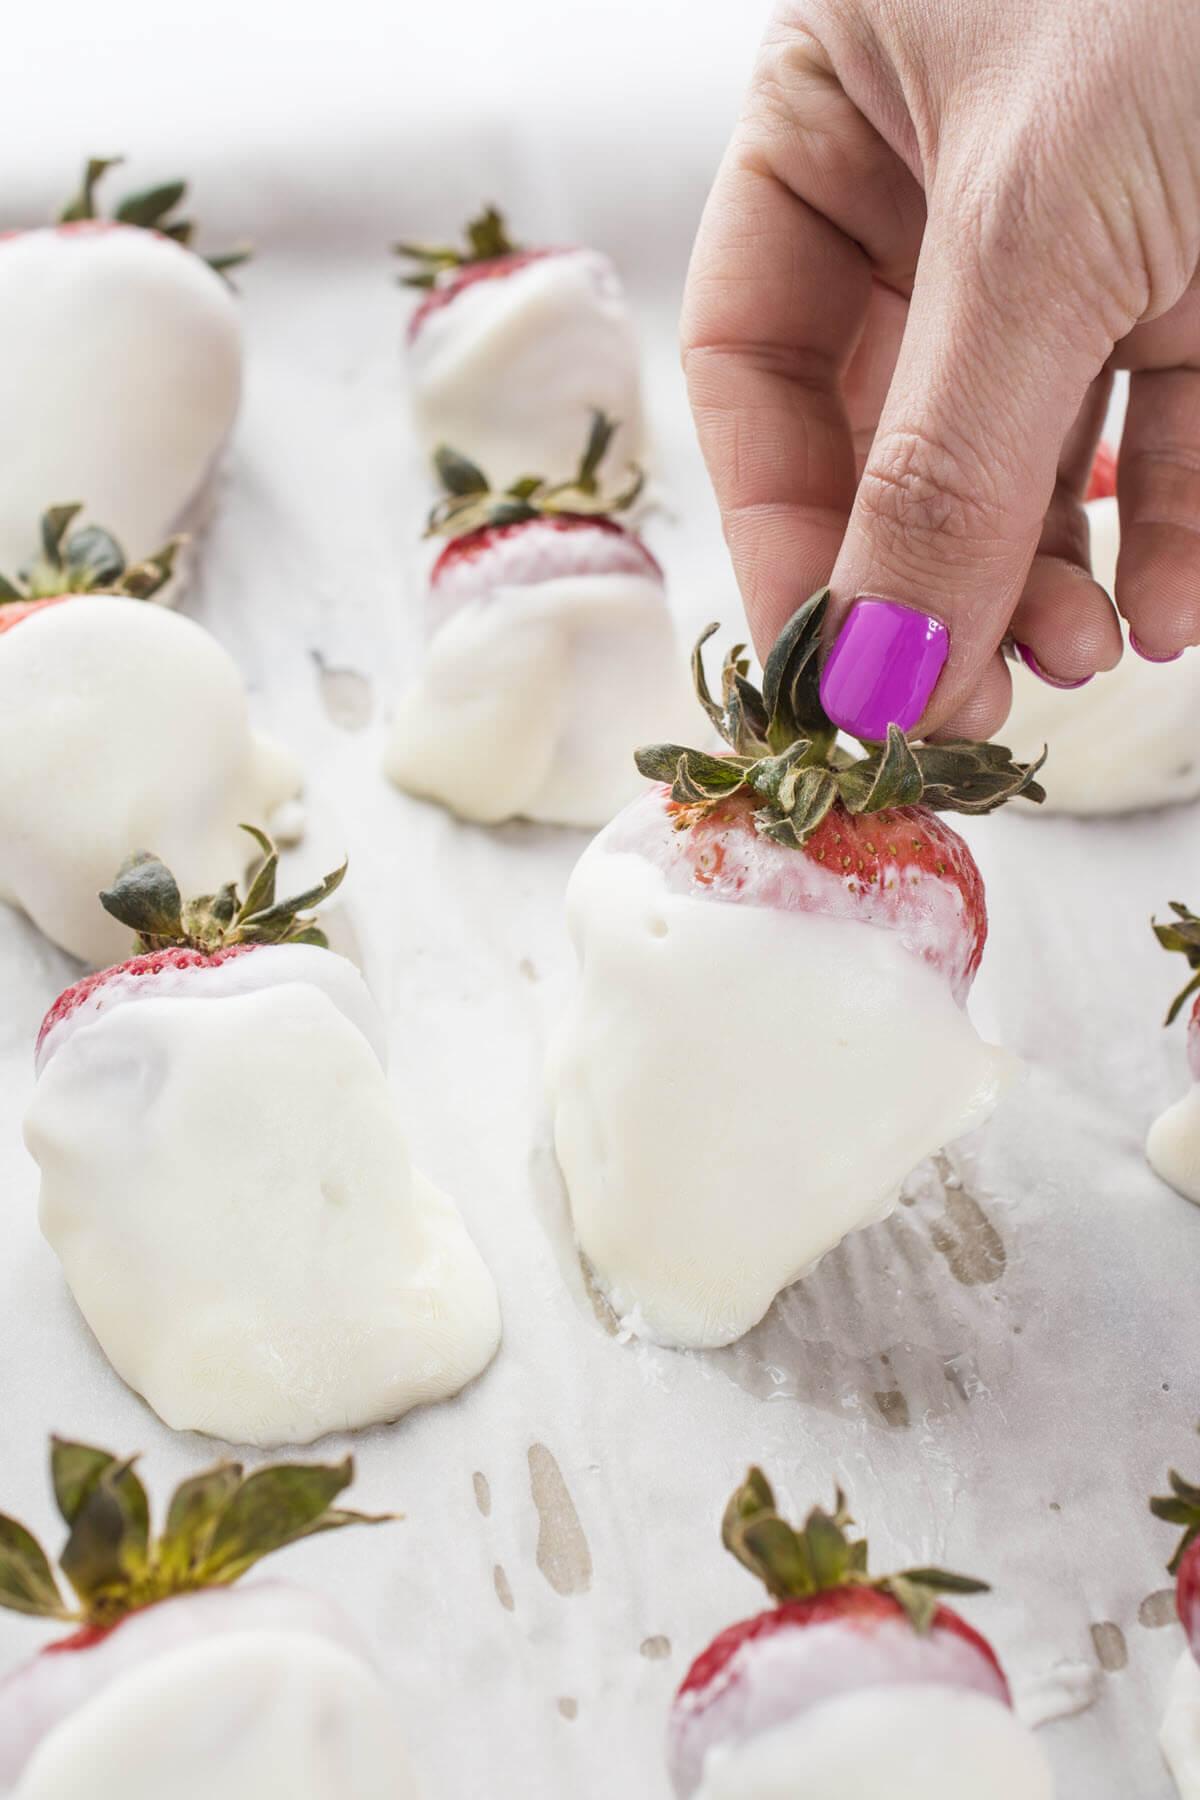 Frozen Yogurt Coated Strawberries Recipe